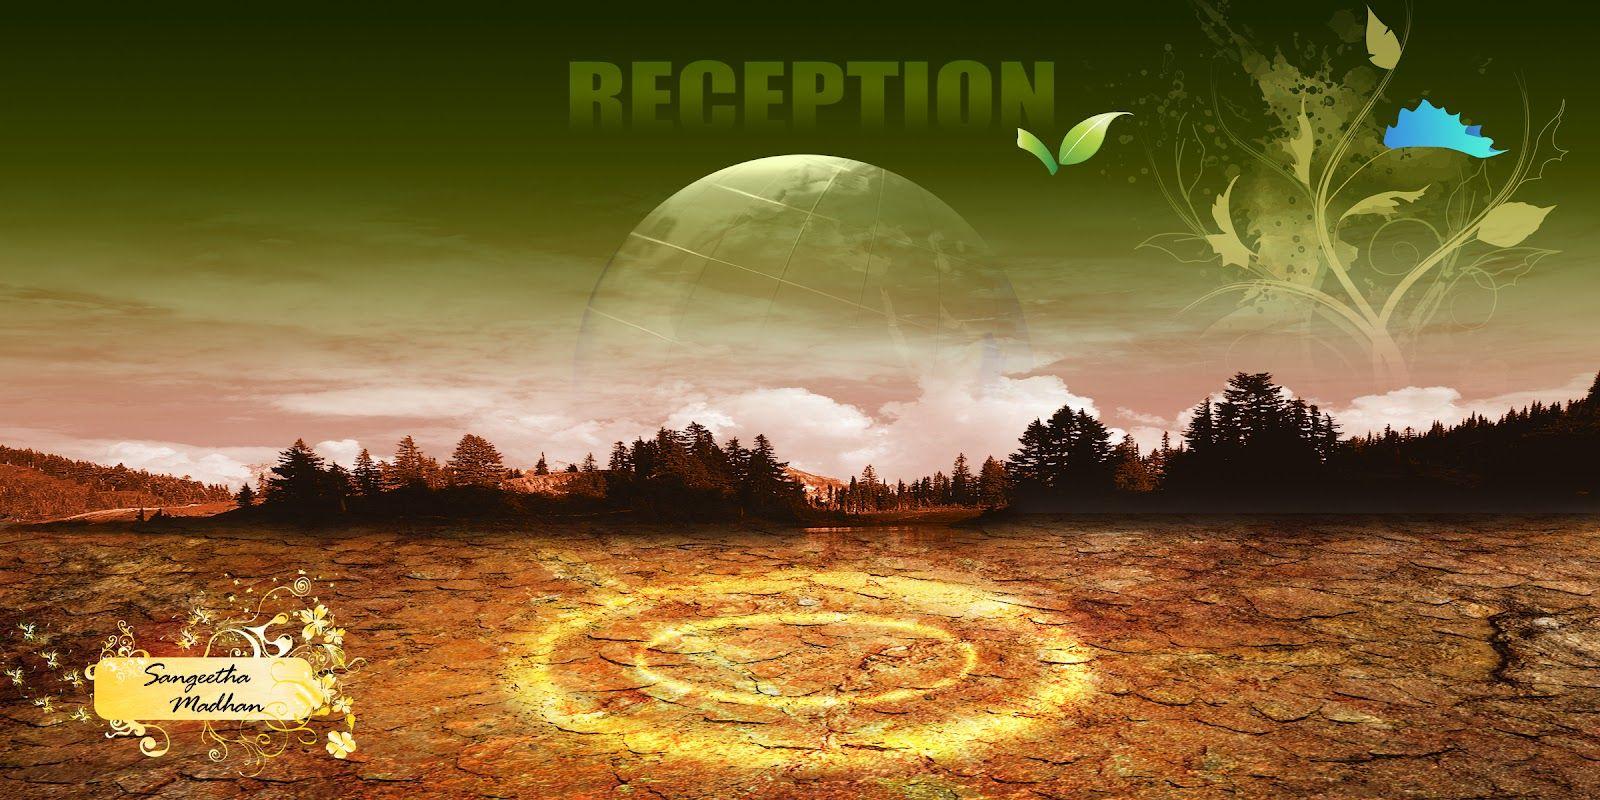 Karizma Album Background 12x30 Hd Images In High Resolution